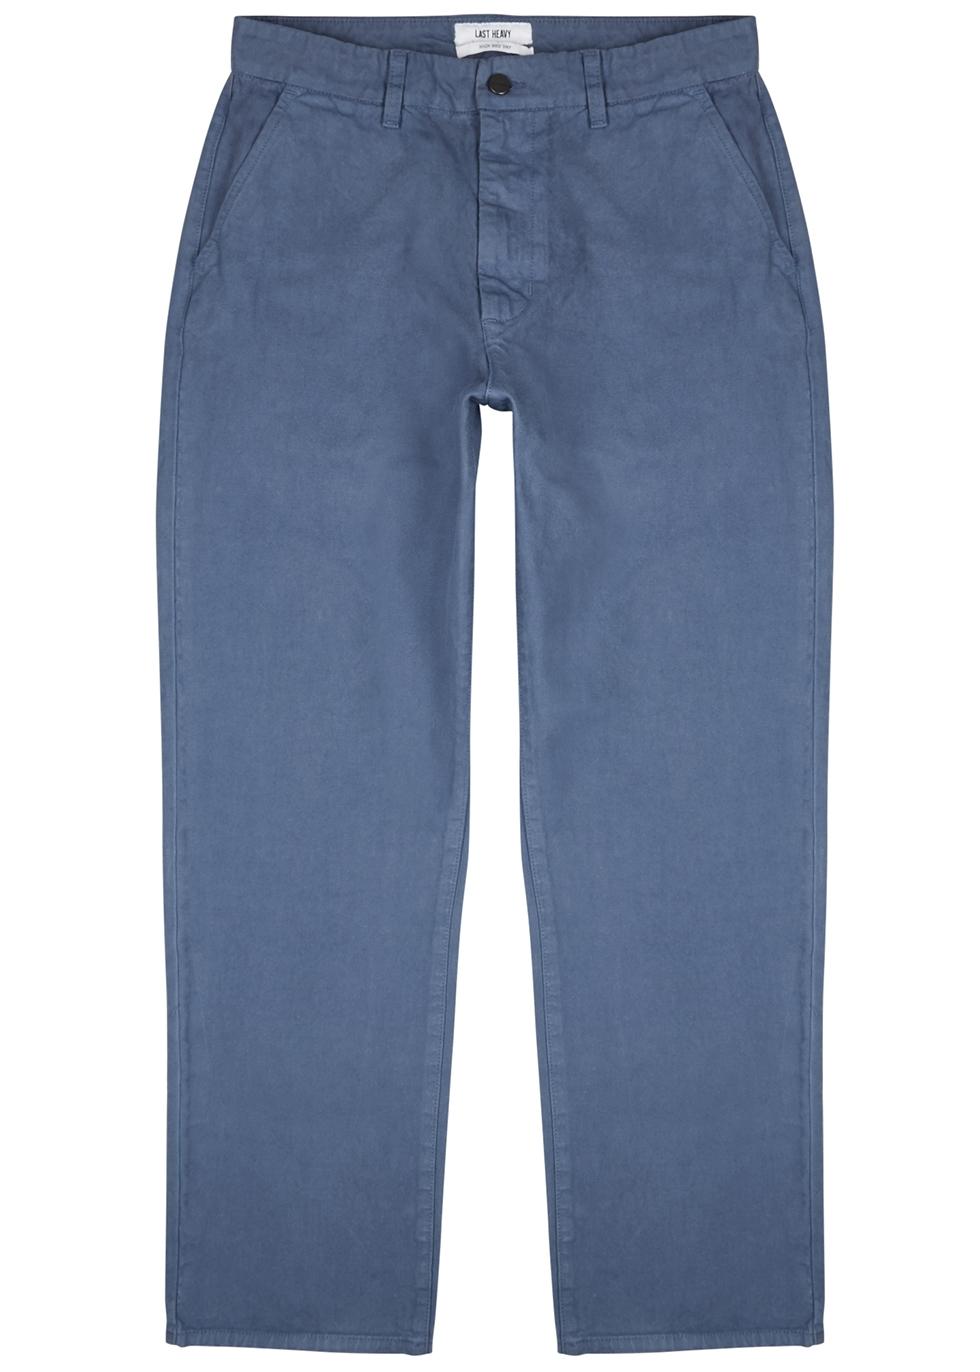 Blue straight-leg denim chinos - Last Heavy